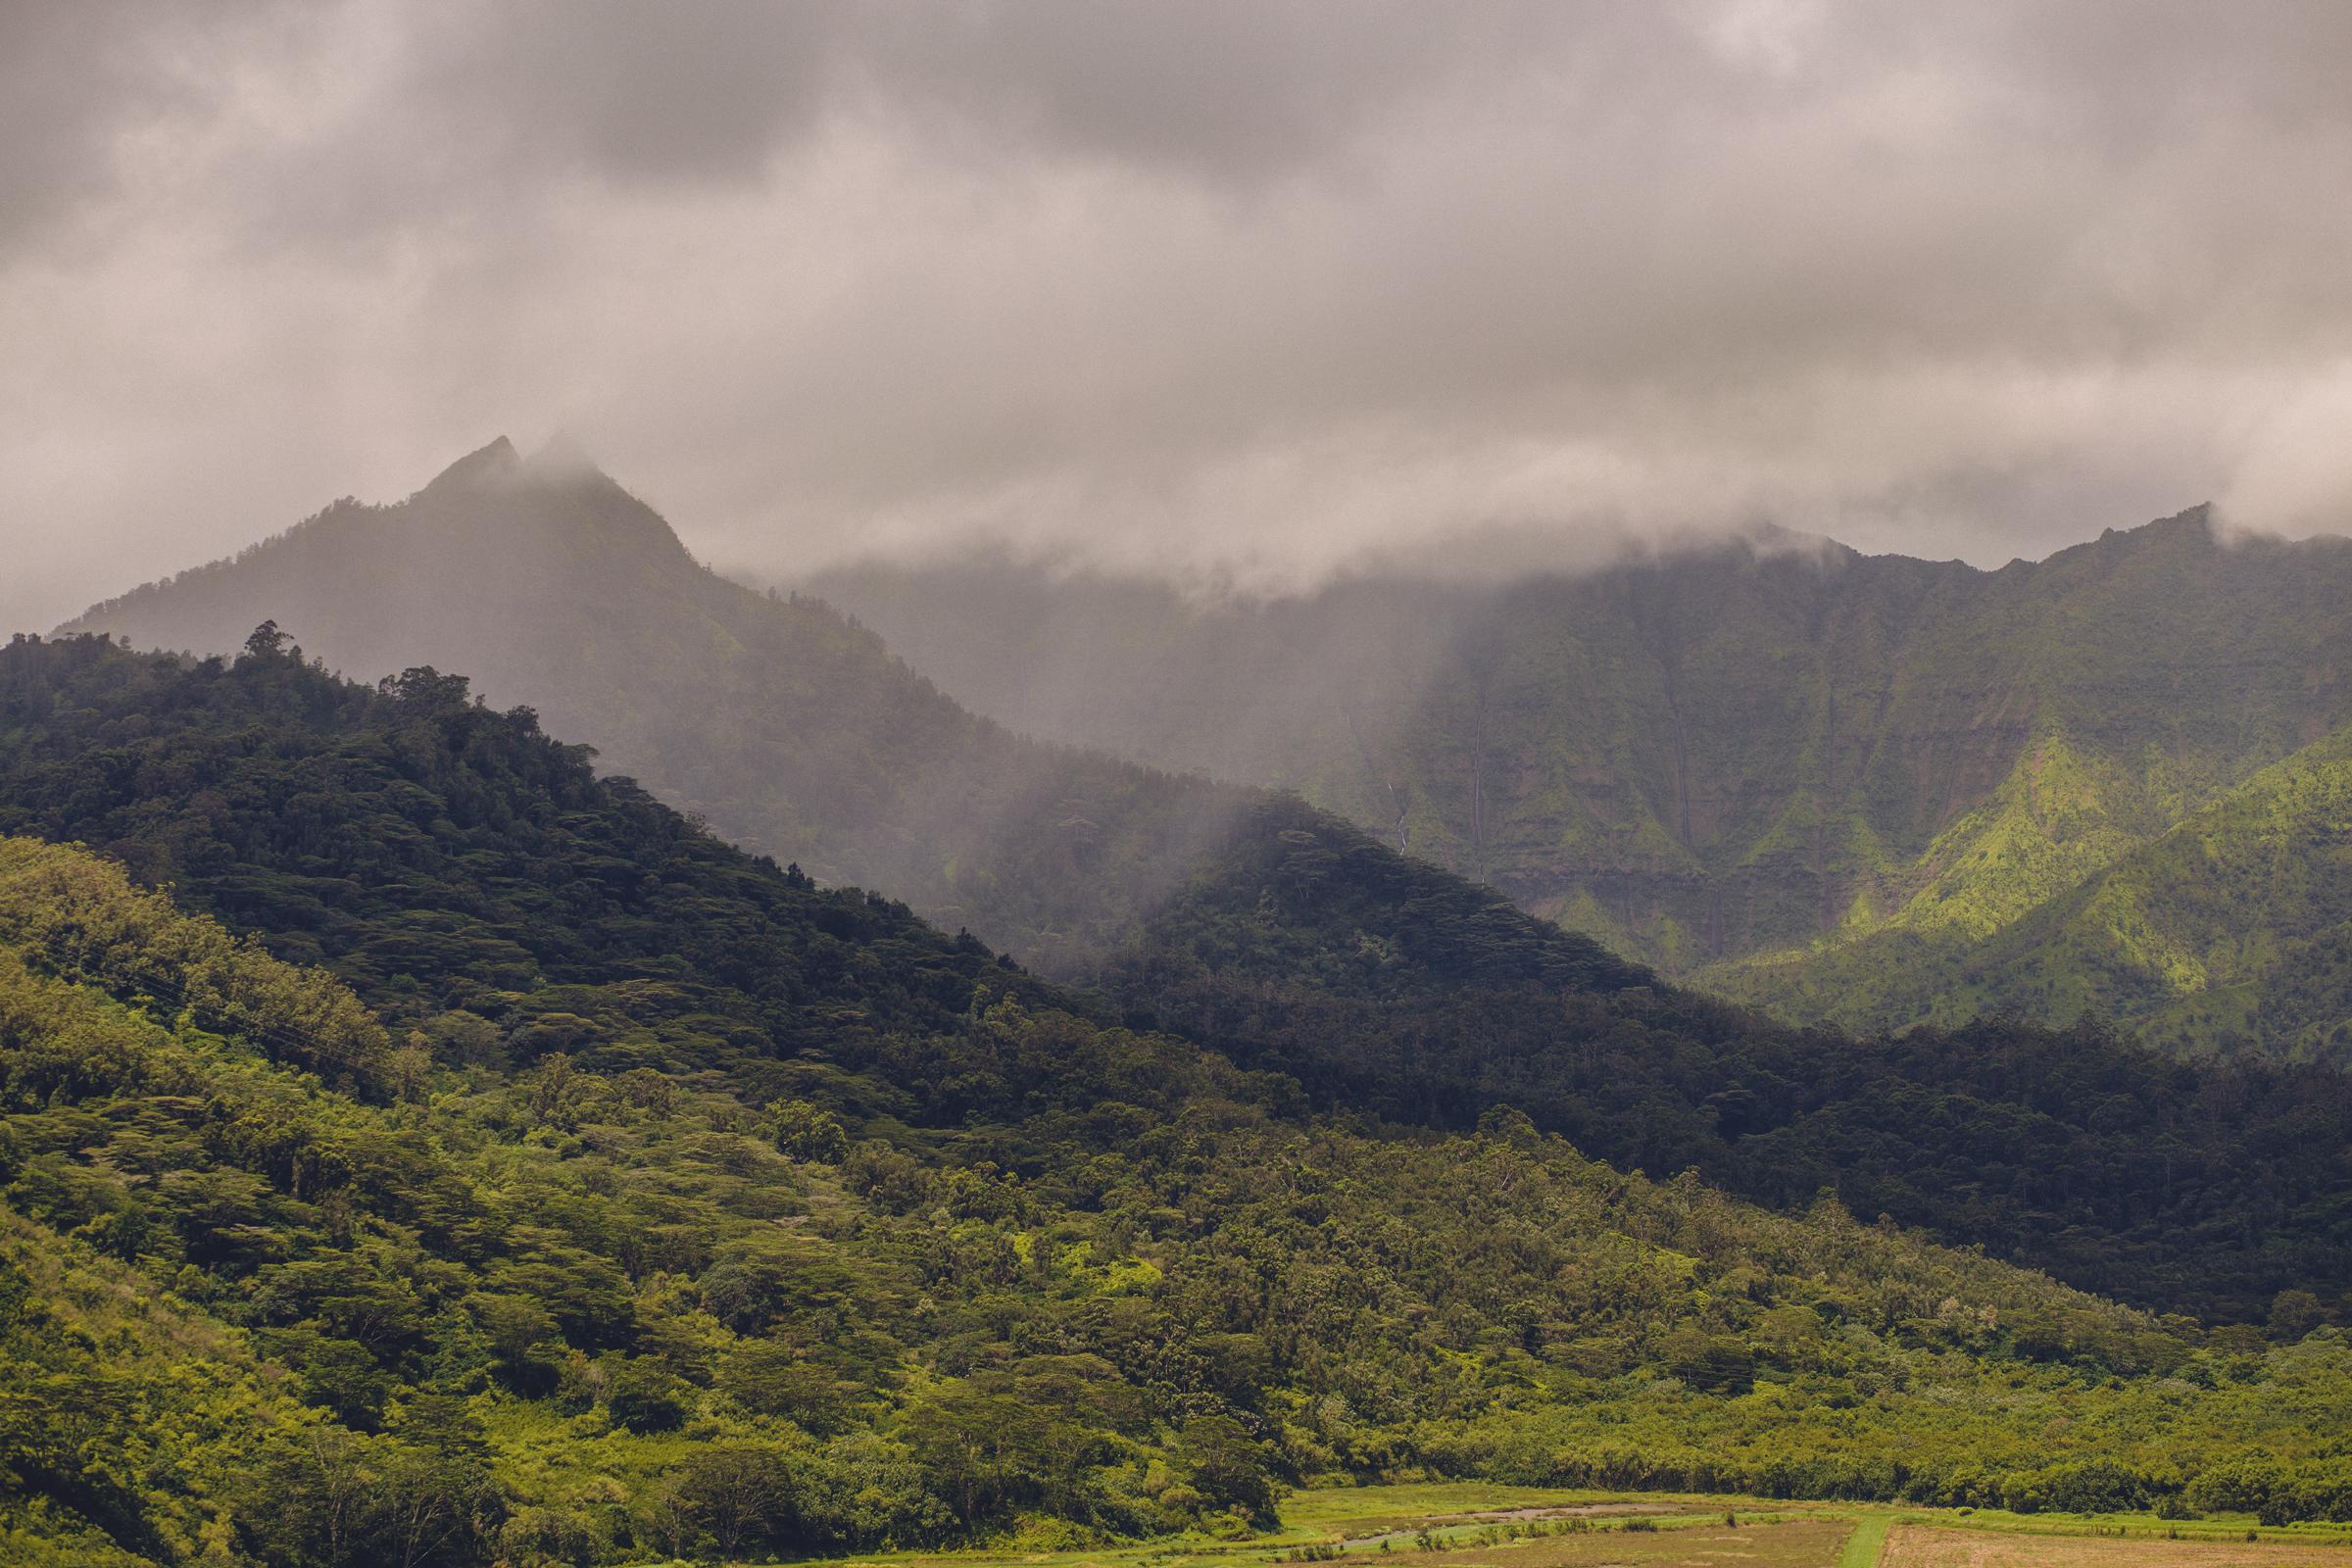 IMG_2421-KAUAI-HAWAII-JENNIFER-PICARD-PHOTOGRAPHY.jpg